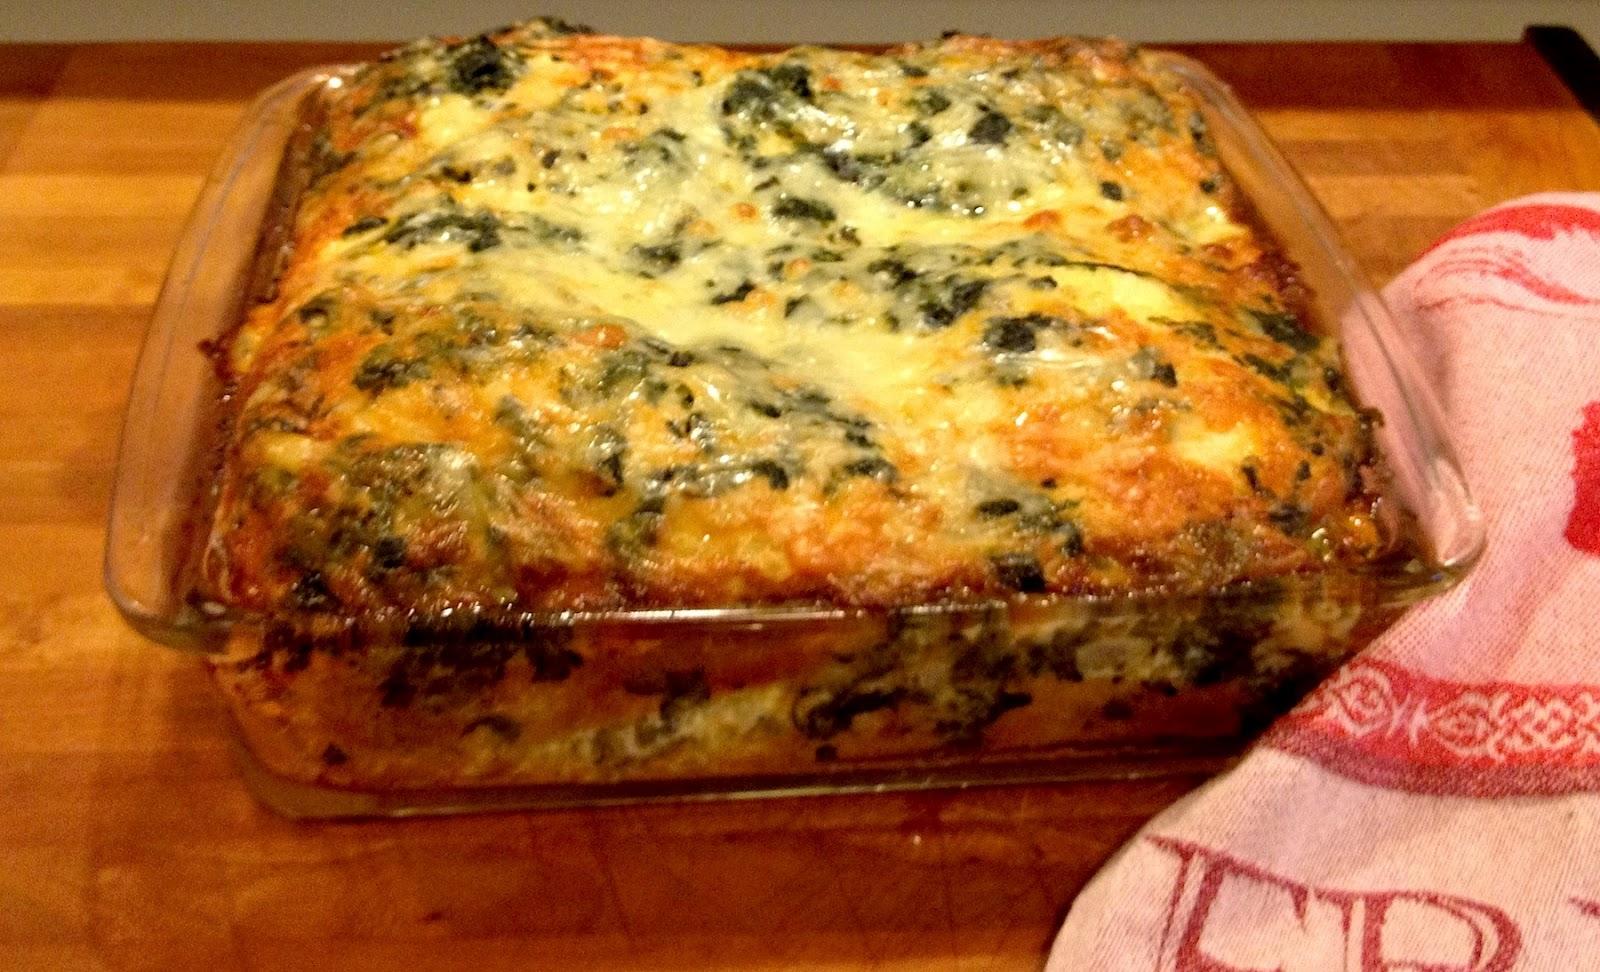 ... : For Breakfast, Lunch or Dinner: Spinach, Mushroom & Bacon Strata